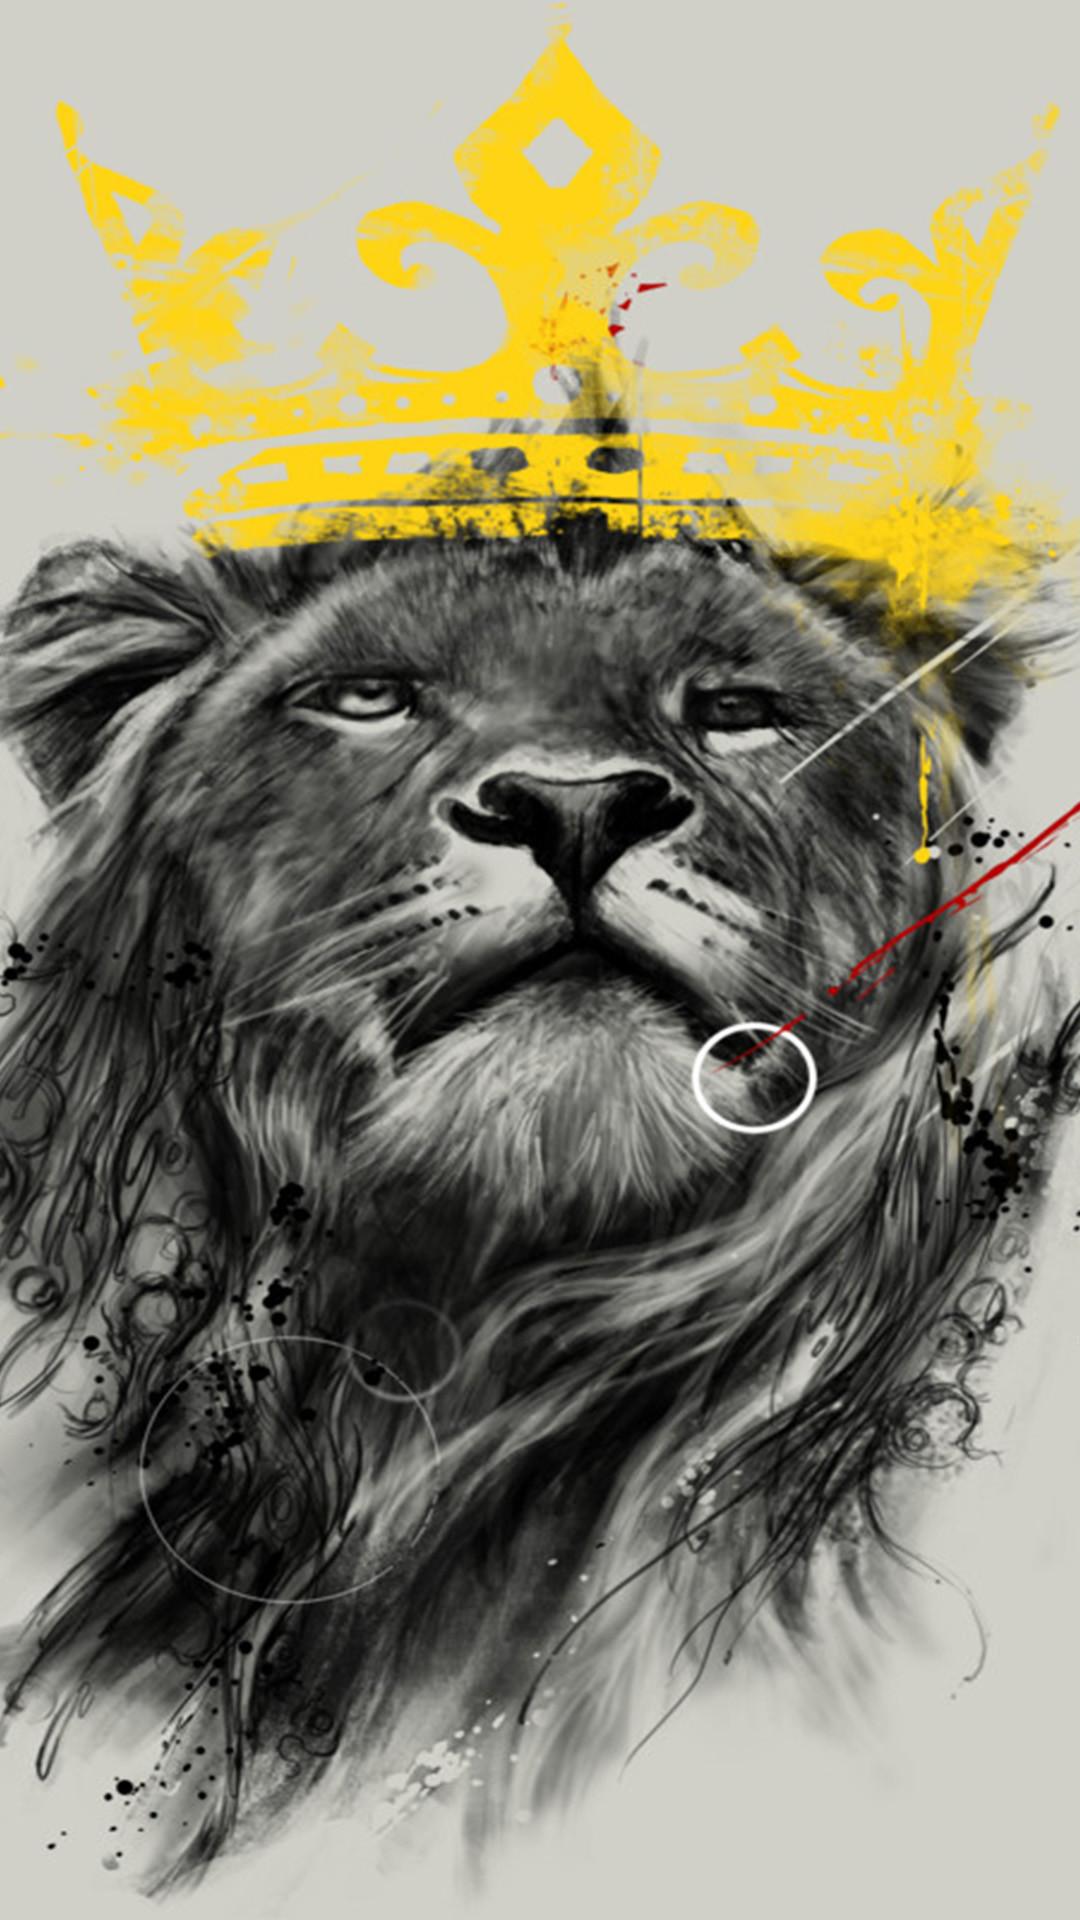 Rasta Lion Wallpaper 63 Images